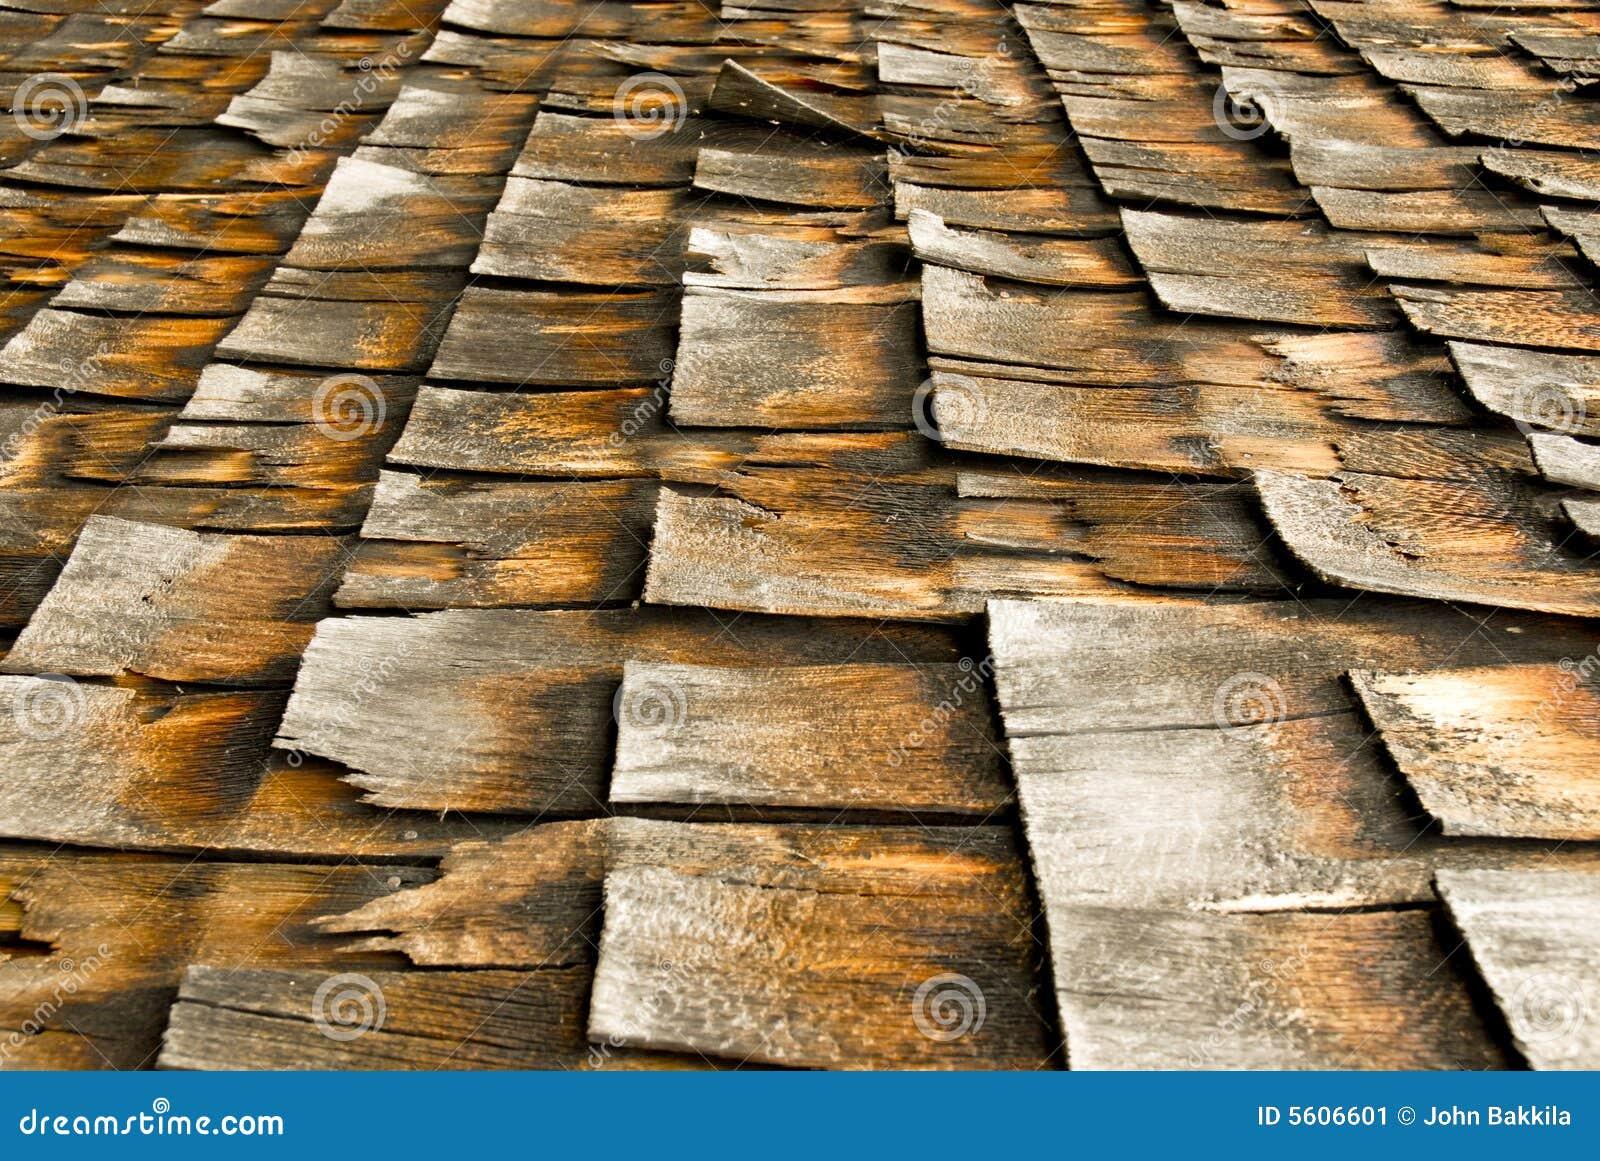 Cedar Shingles Stock Image Image 5606601